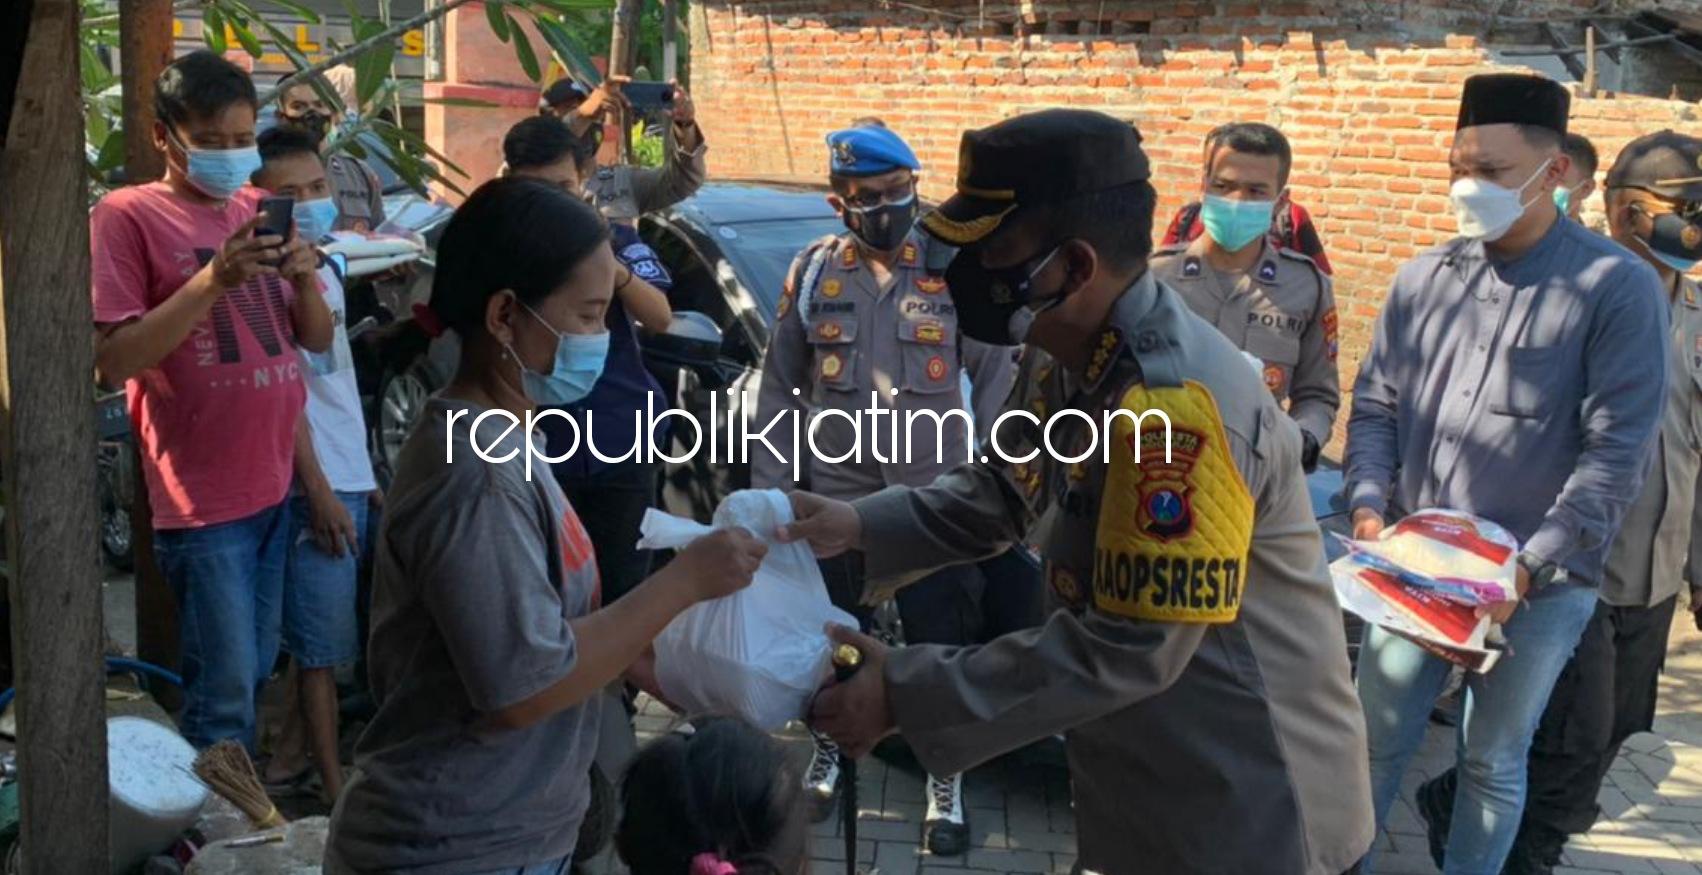 Kapolresta Sidoarjo Turun Bagikan Daging Kurban Door To Door ke Warga Terdampak Pandemi Covid-19